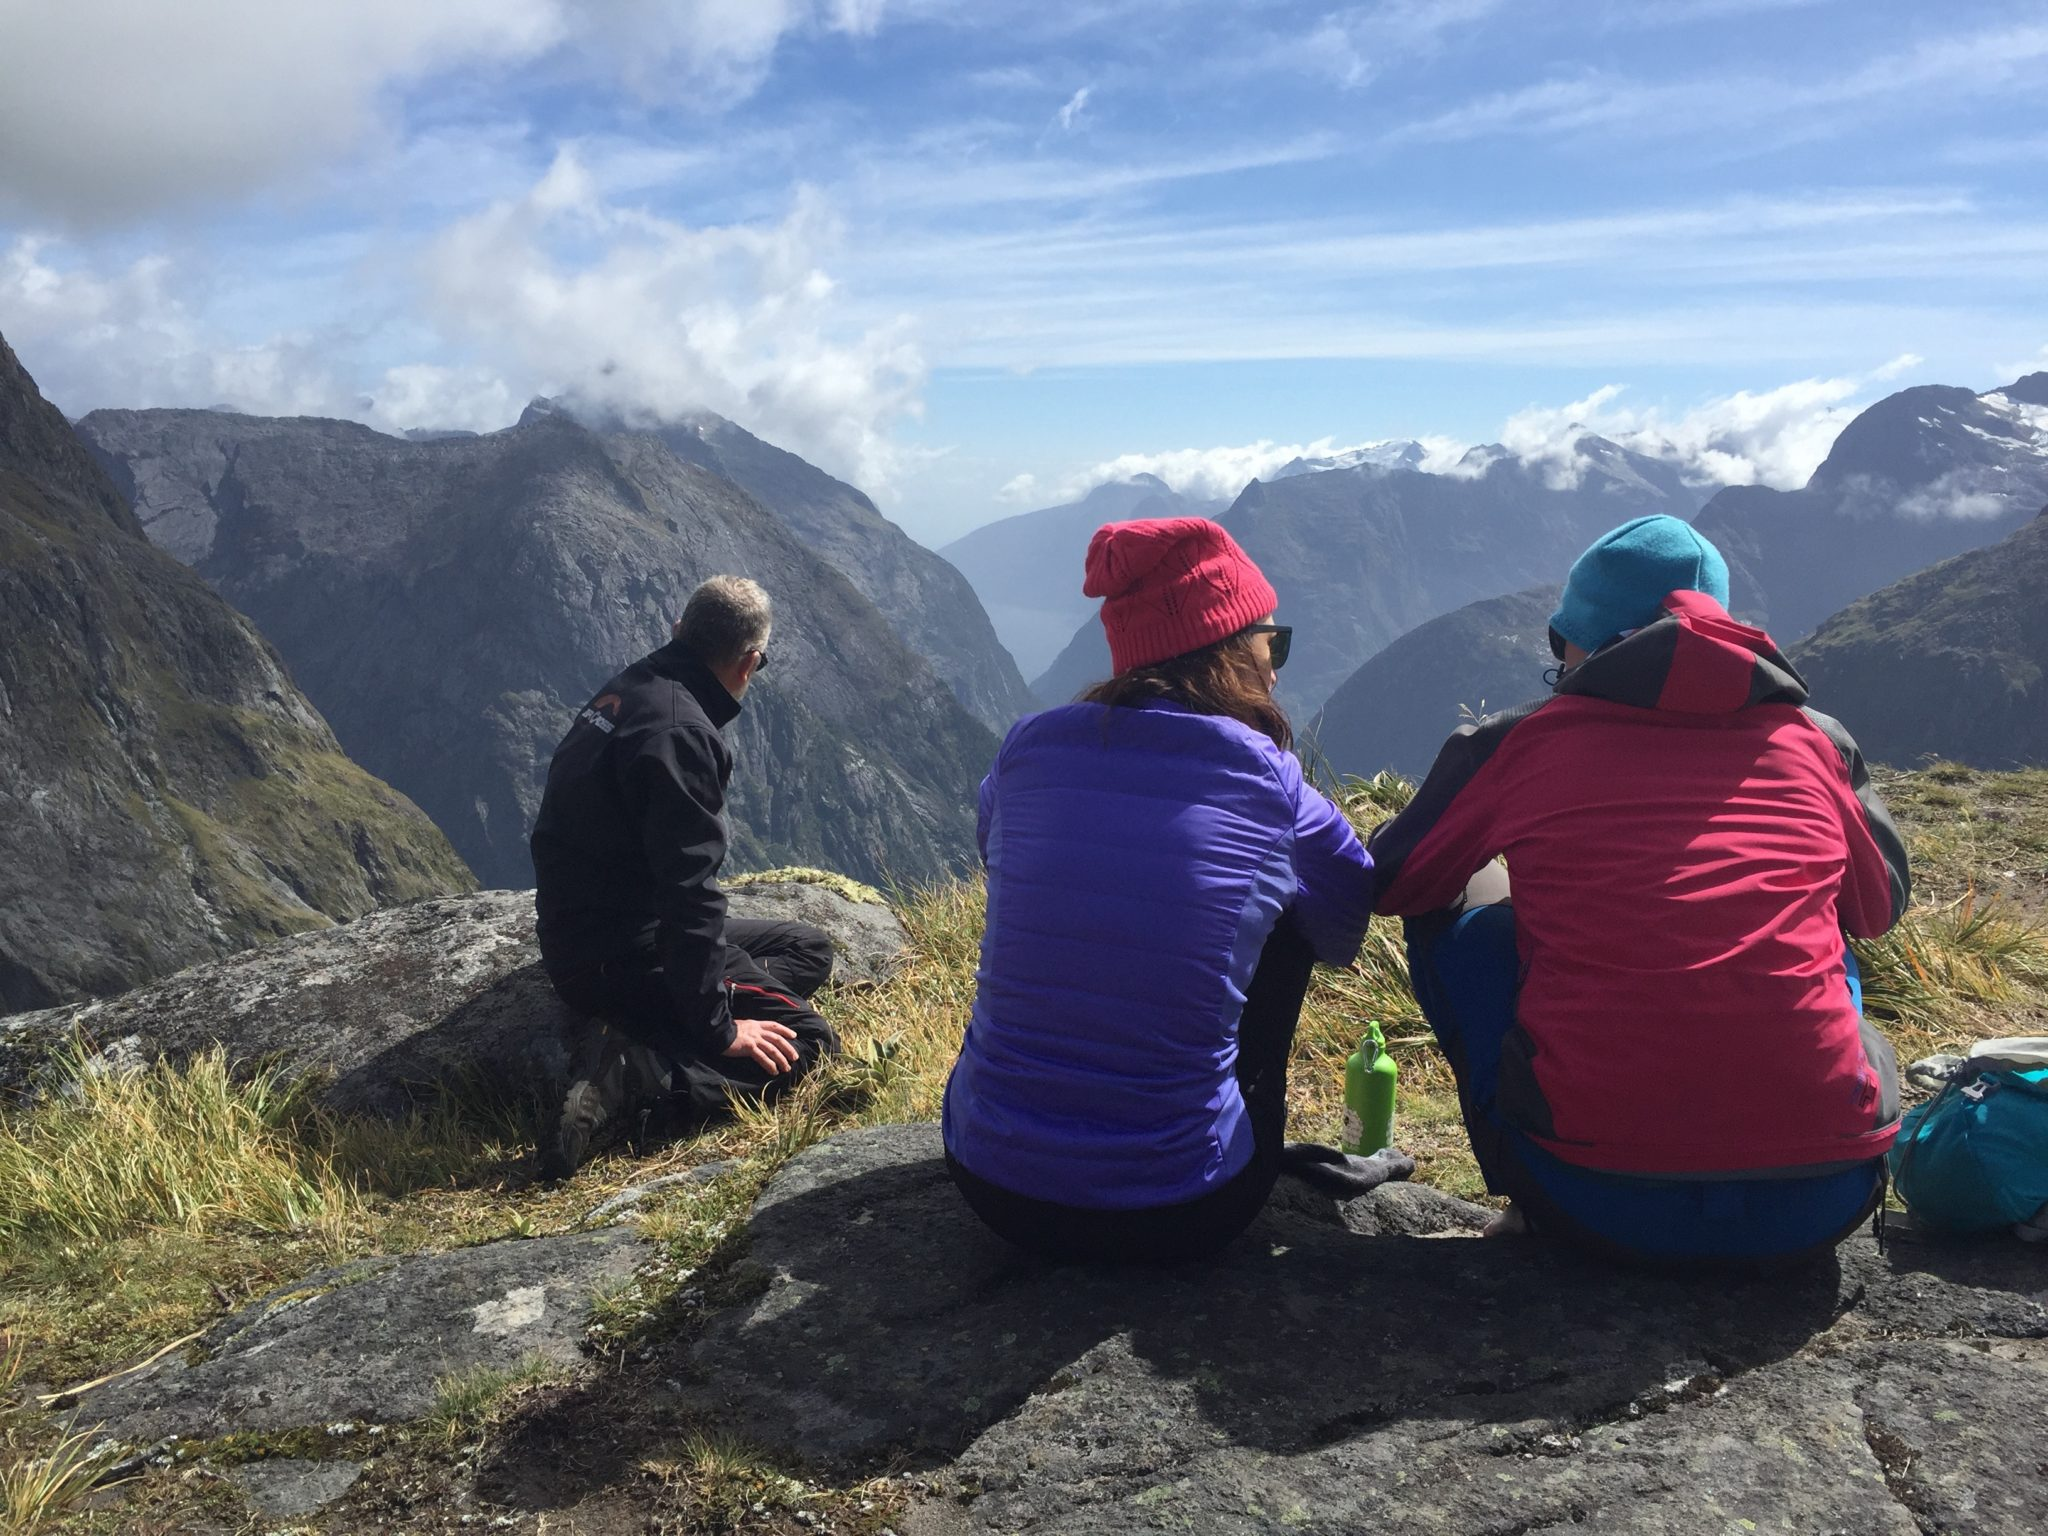 Family Hiking Trips